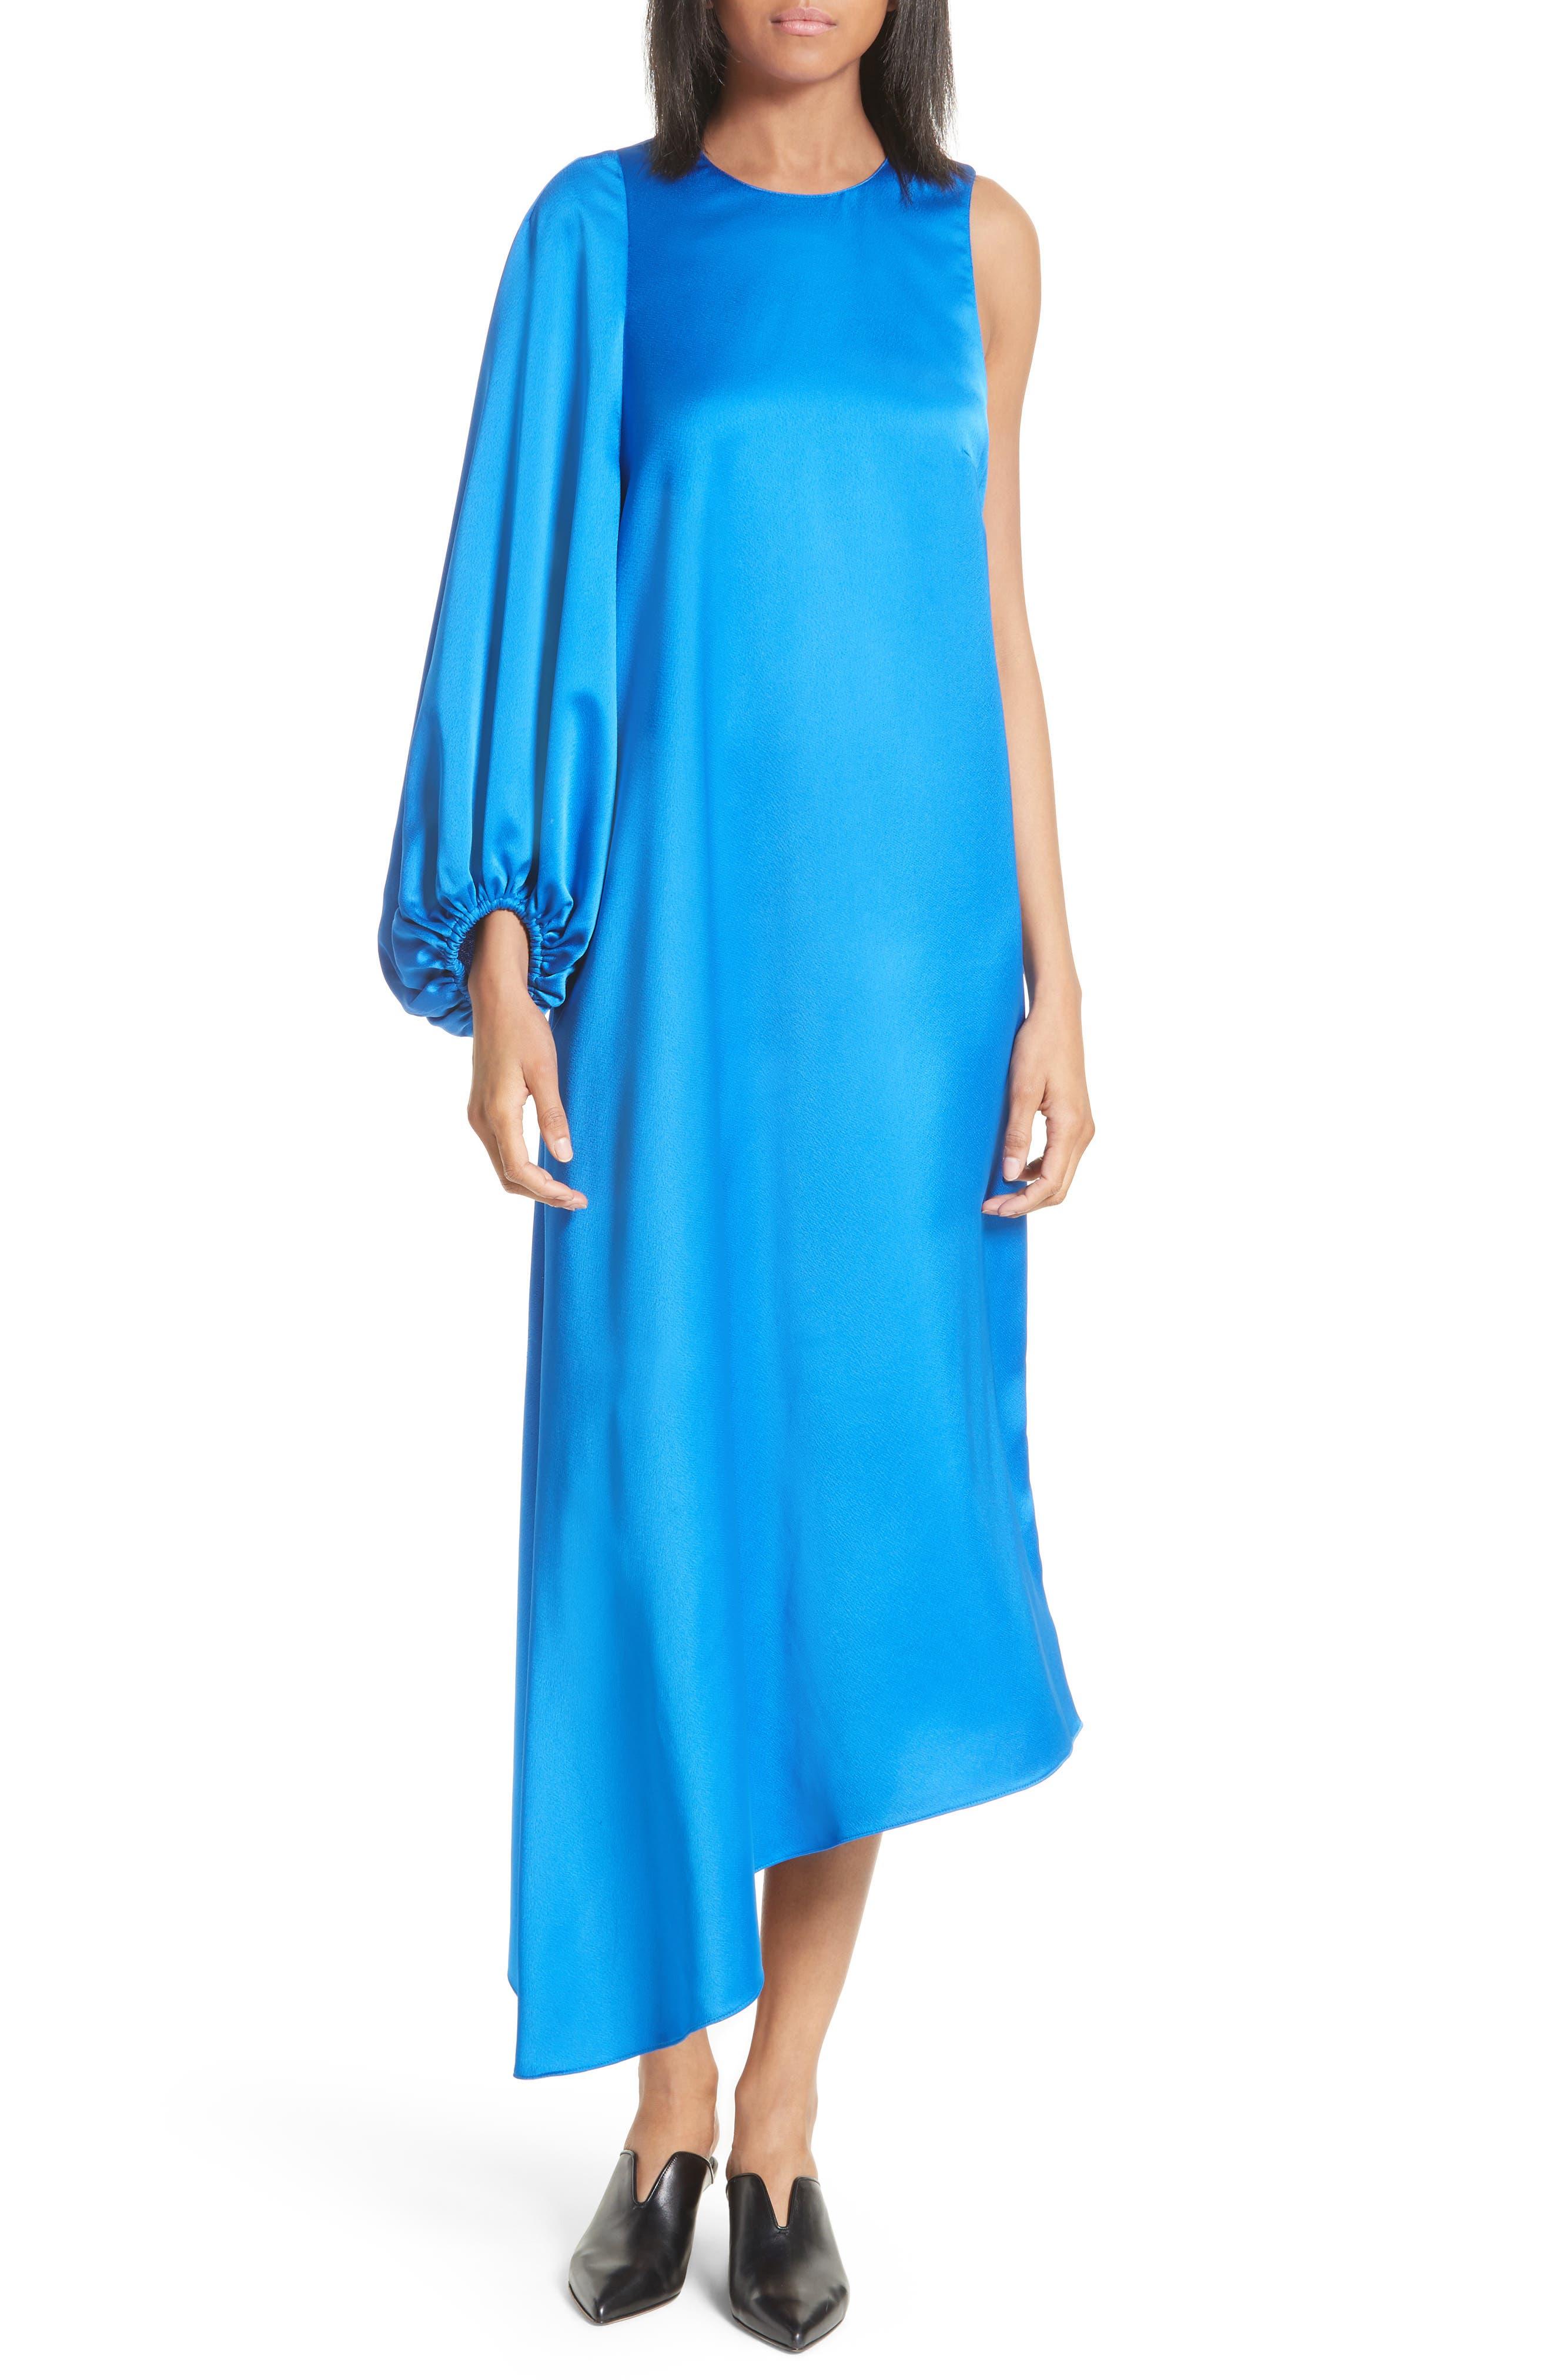 Alternate Image 1 Selected - Tibi Celestia One Sleeve Bias Cut Satin Dress